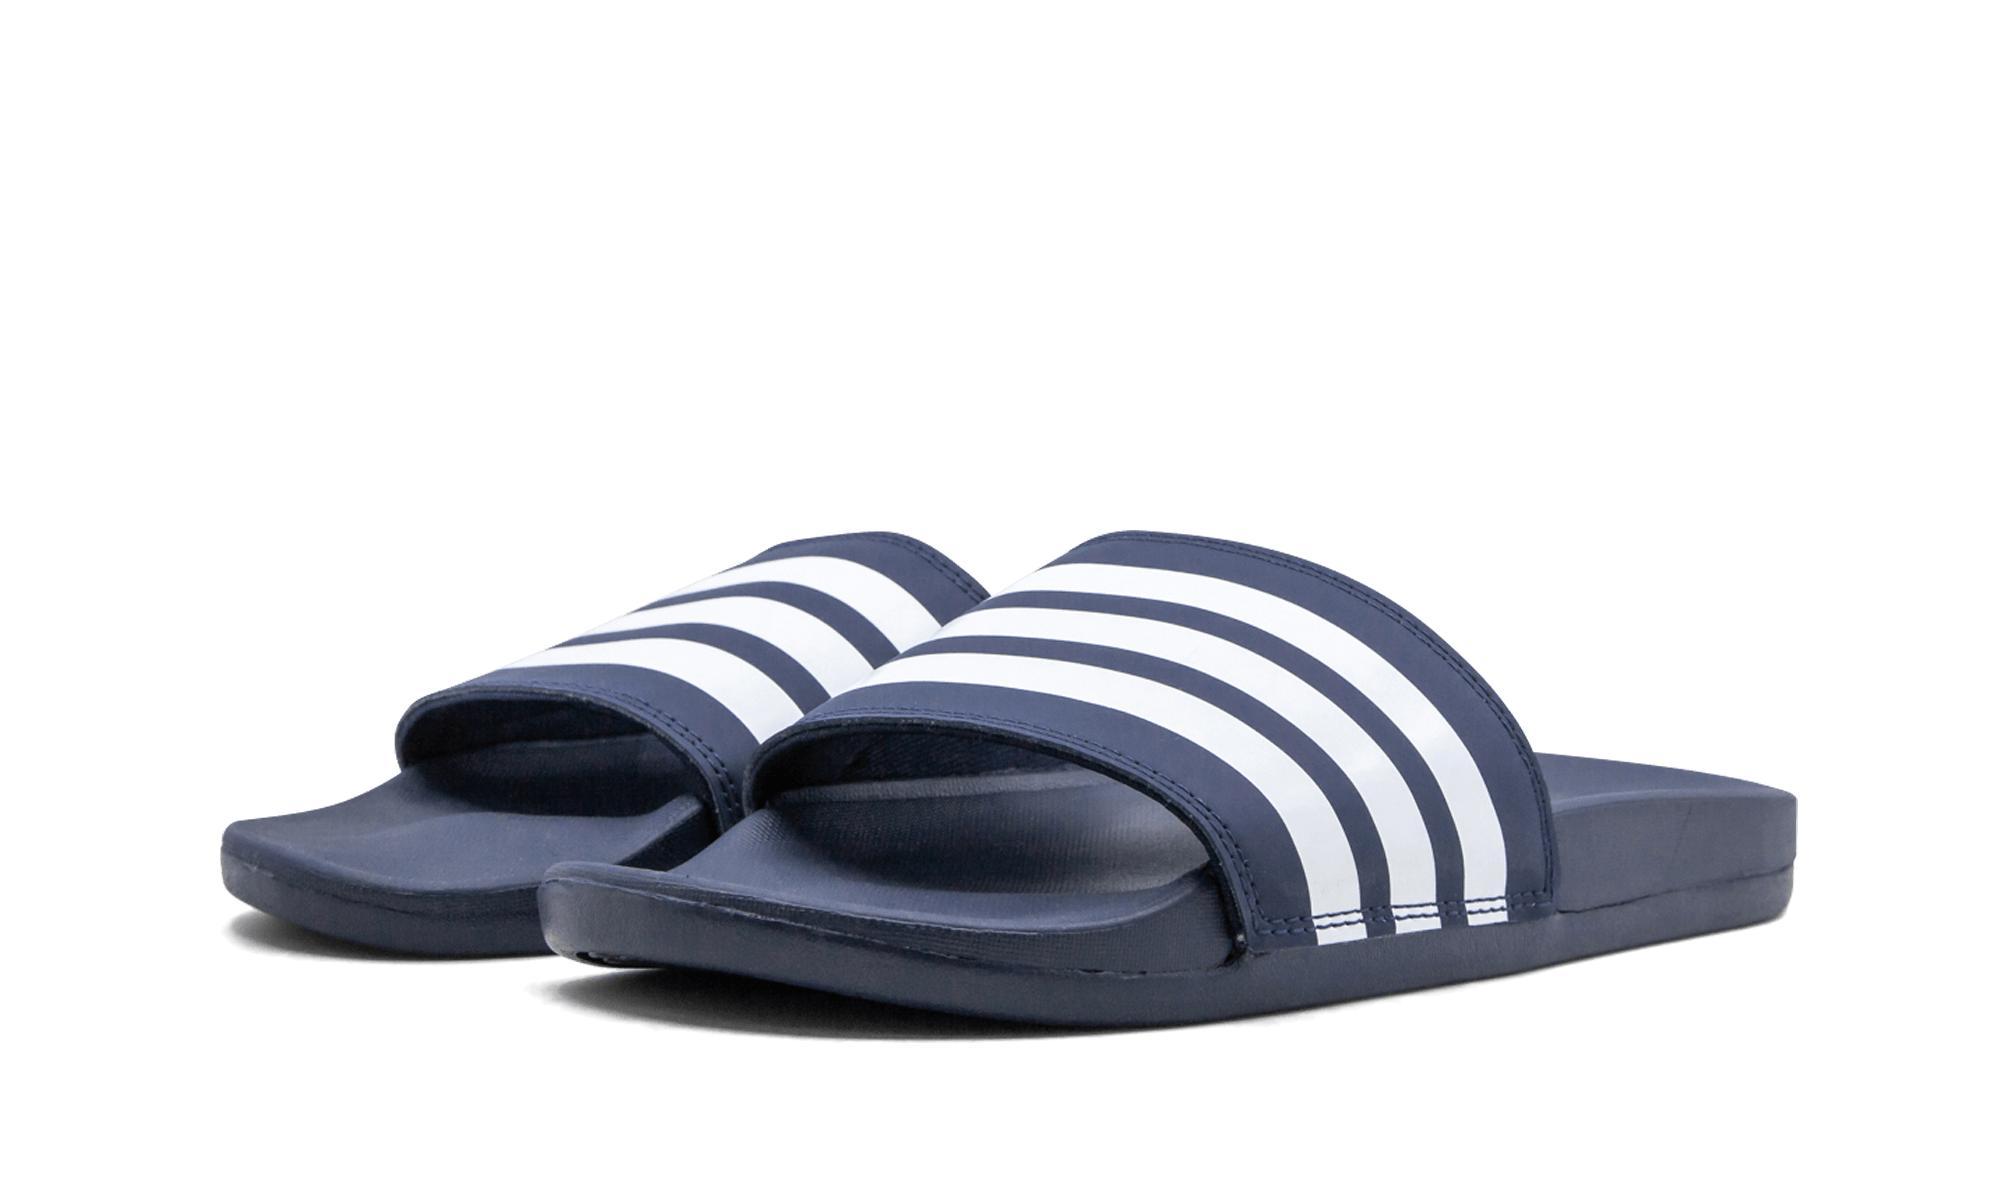 a4017f5d41b Lyst - adidas Adilette Cf+ Stripes W Fam in Blue for Men